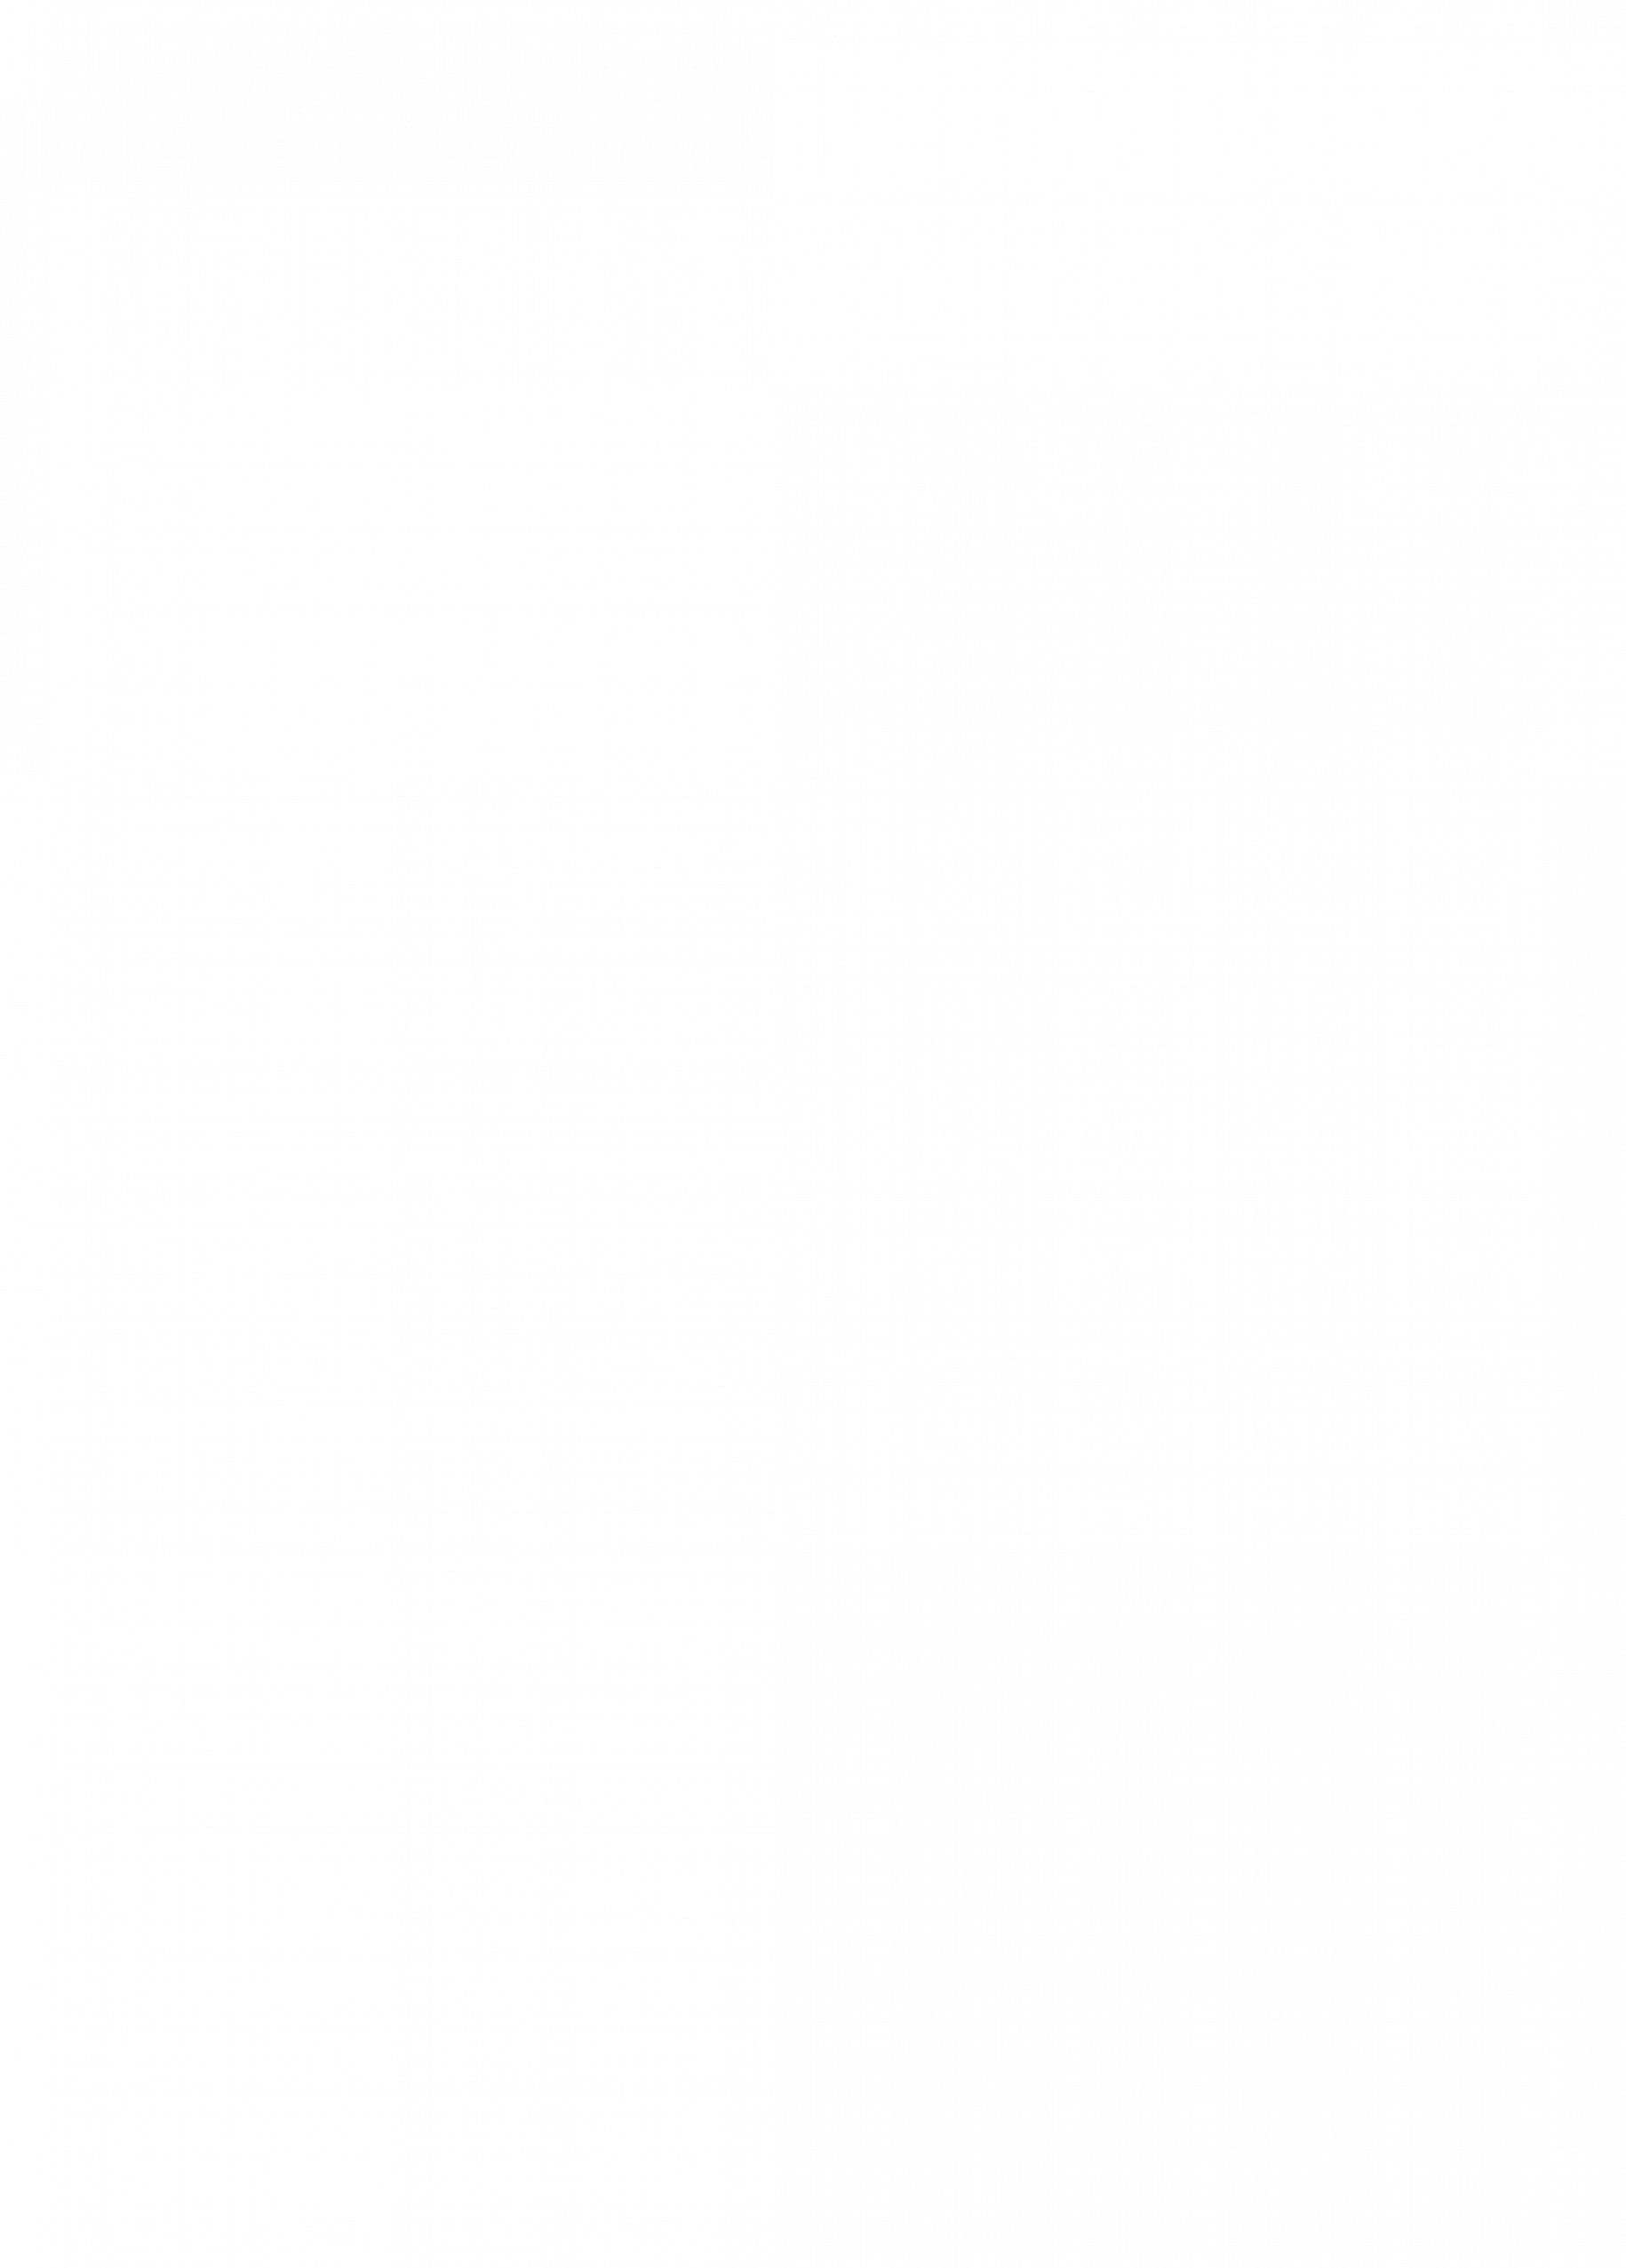 Armlehnsessel im schwedischen Rokoko